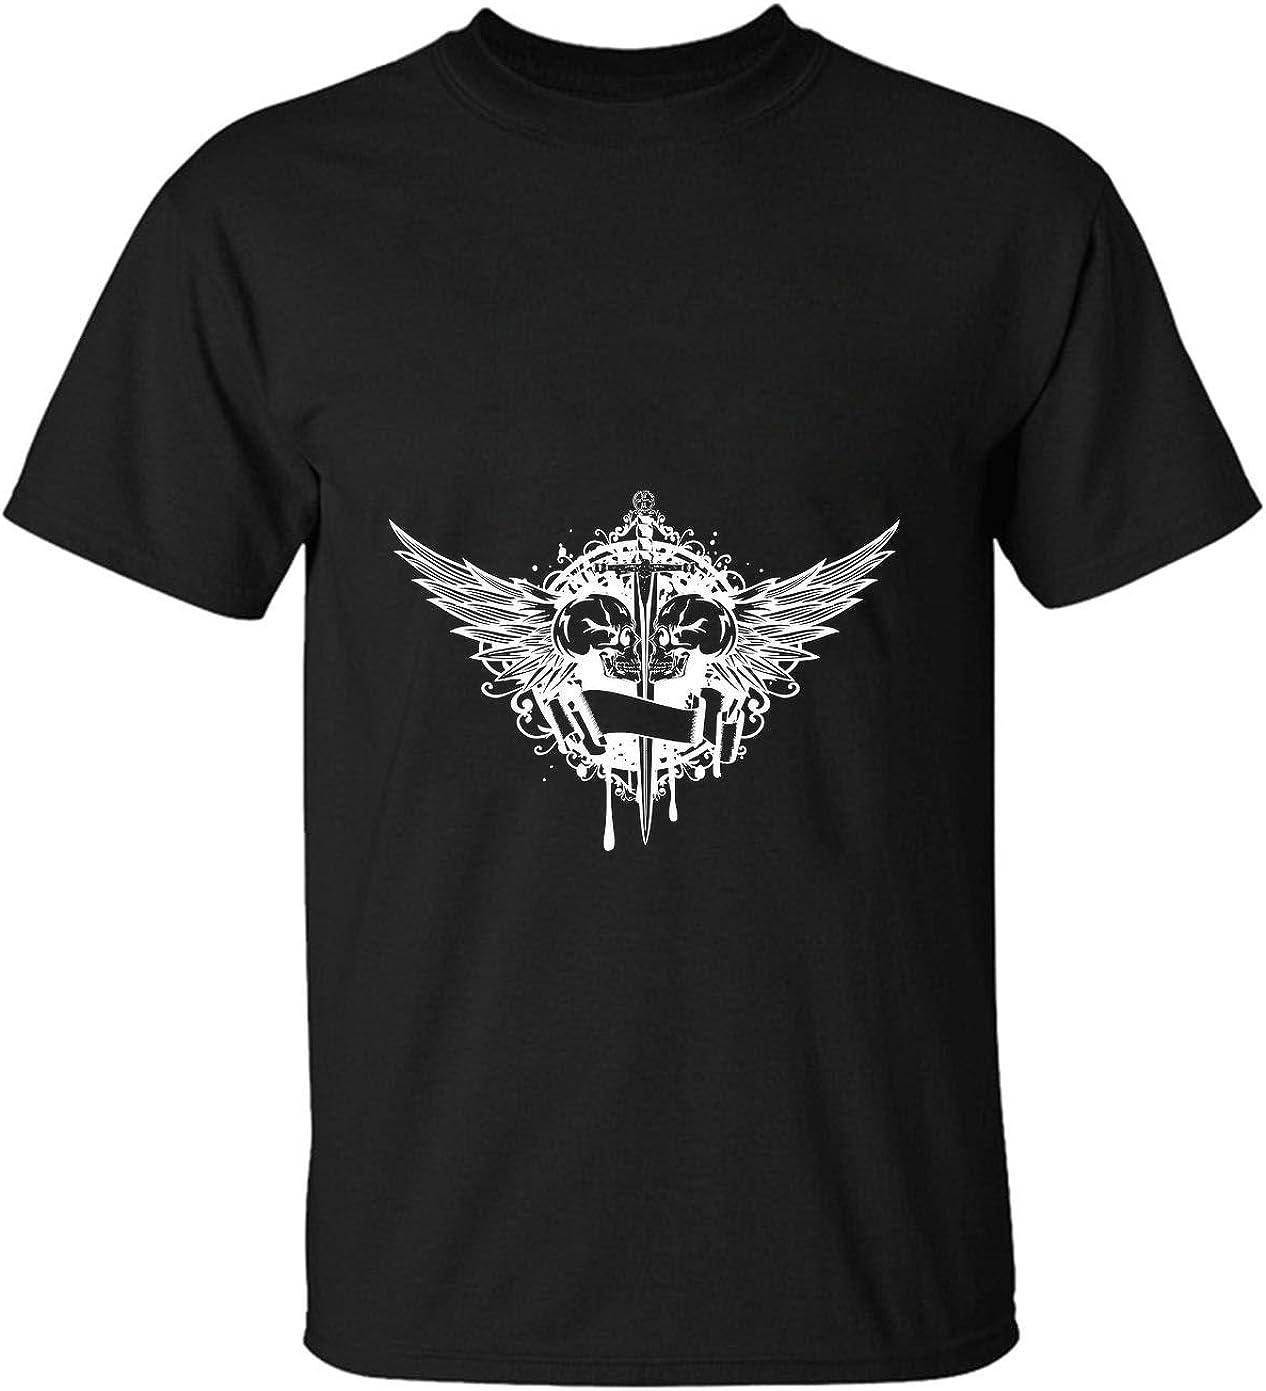 ReRabbit sword with skulls T Shirts For Man